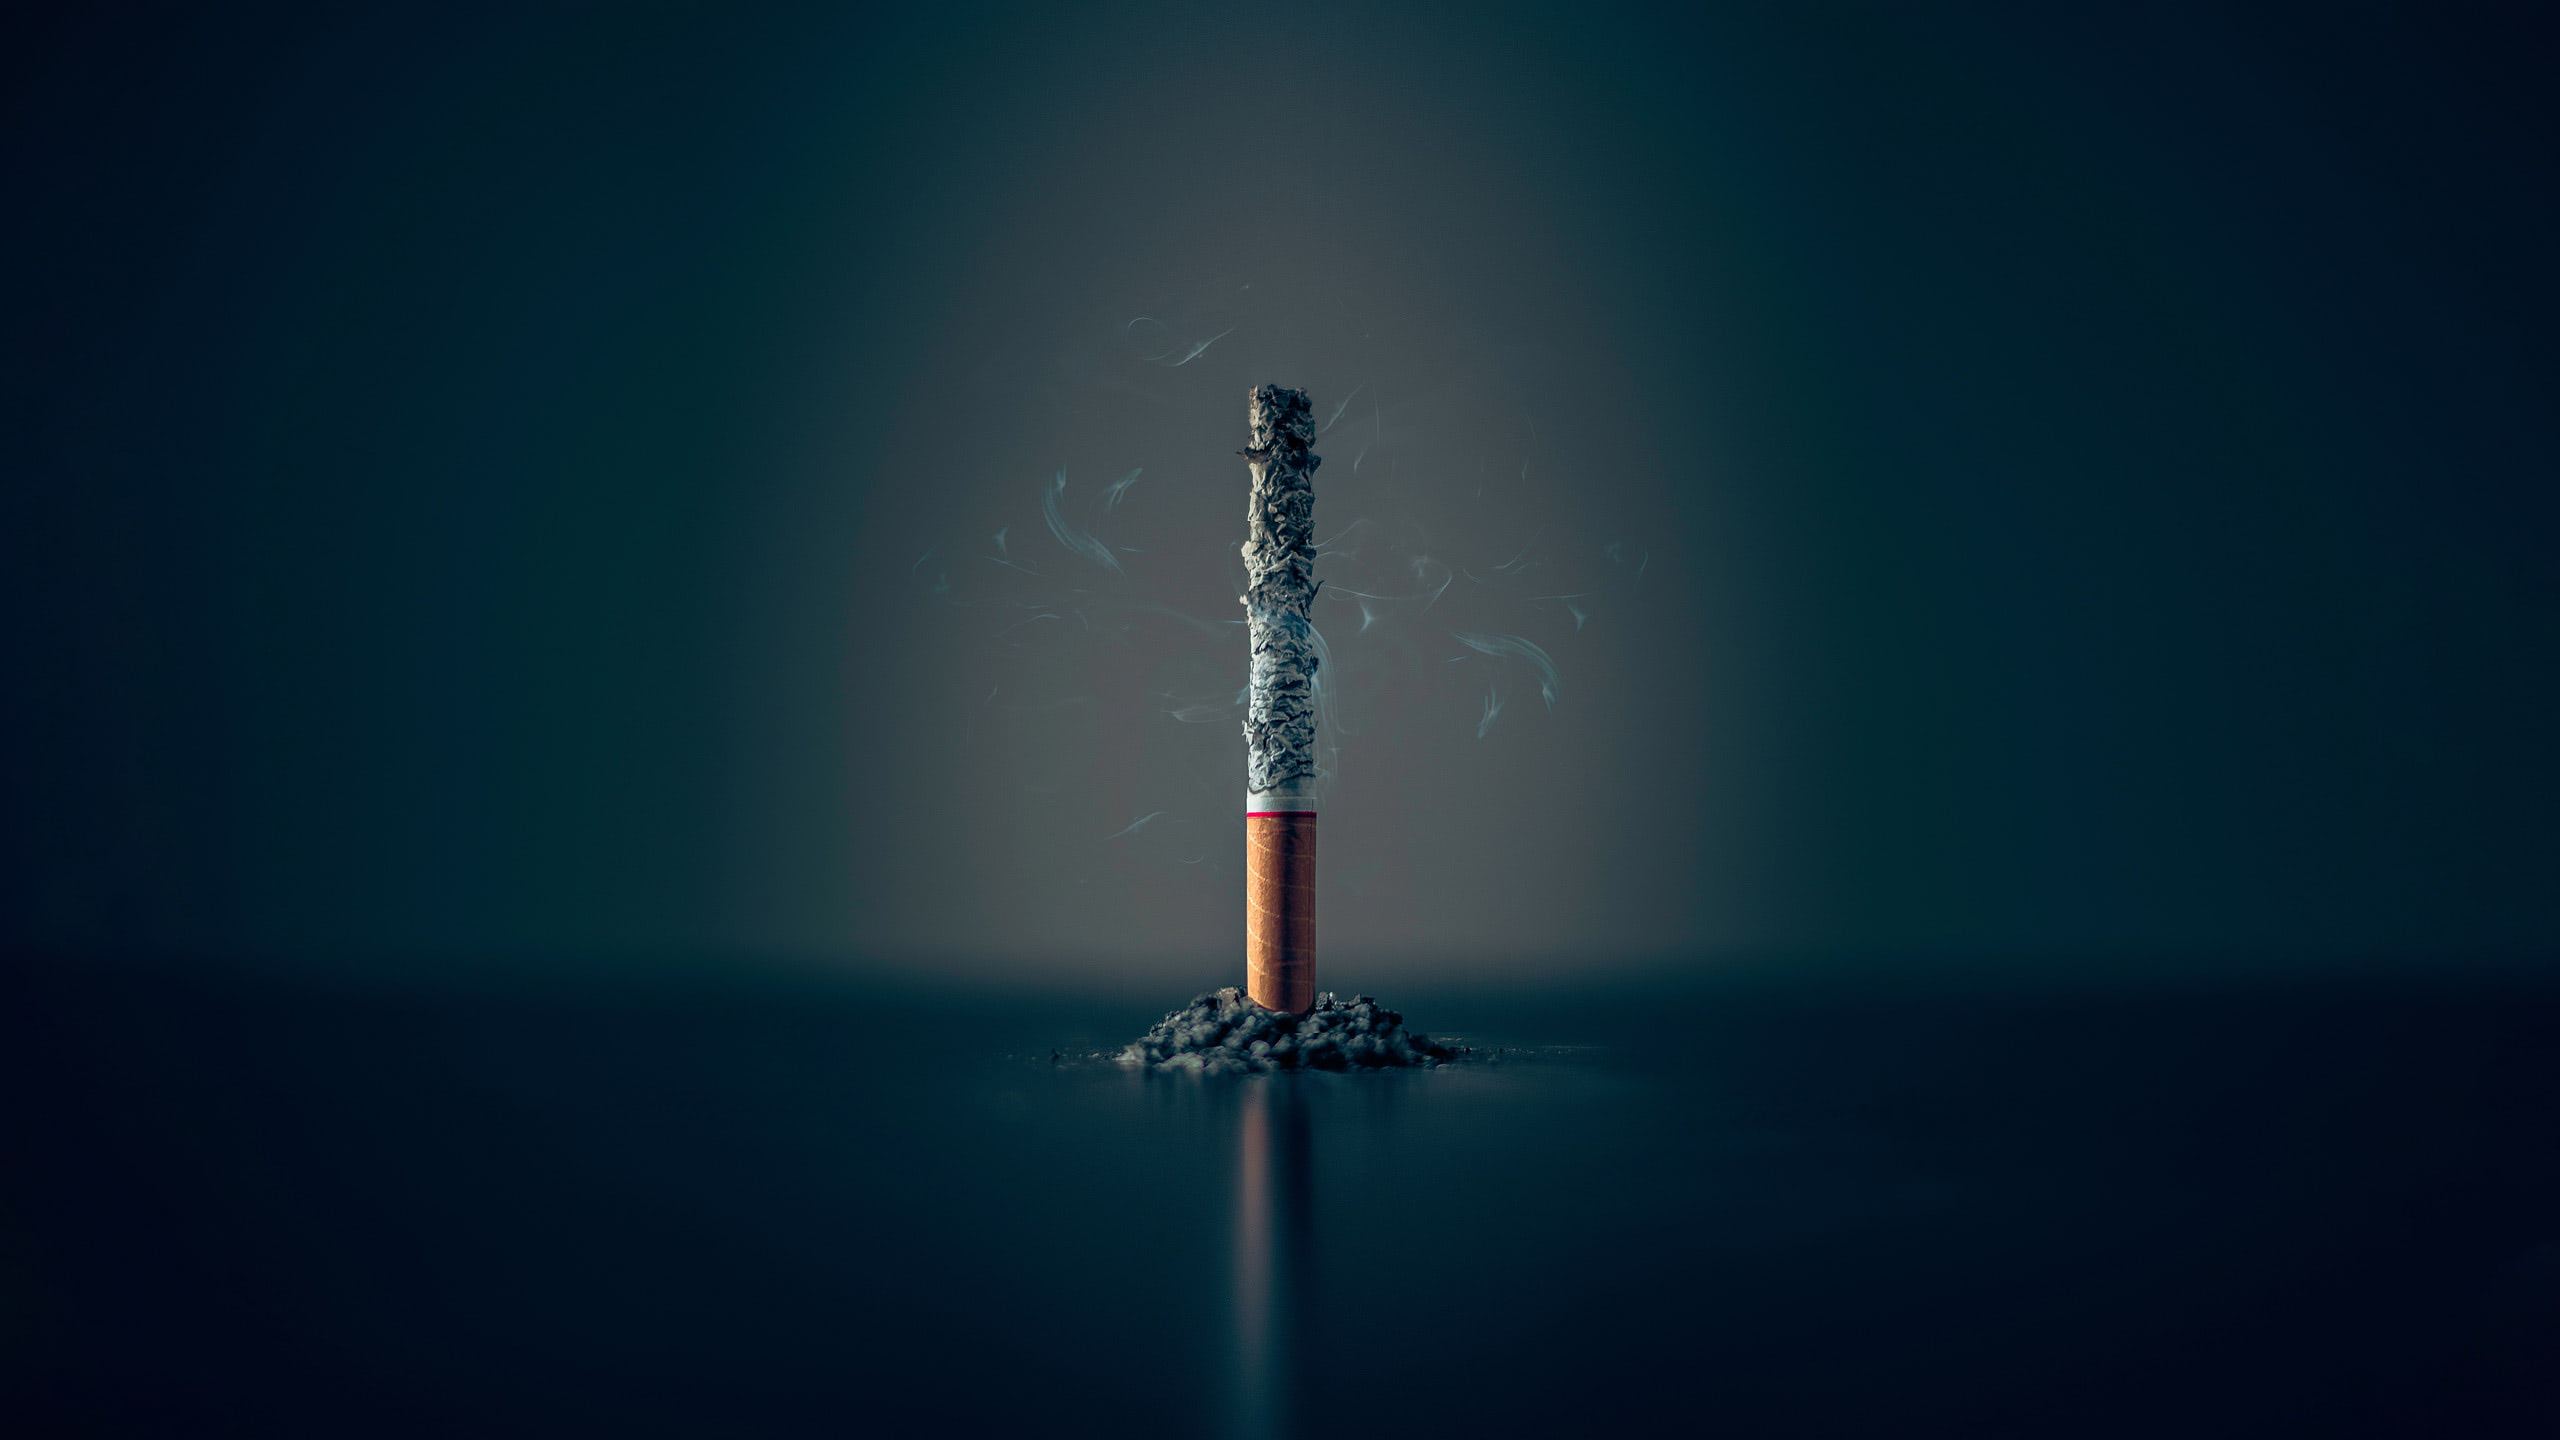 a half-burnt cigarette